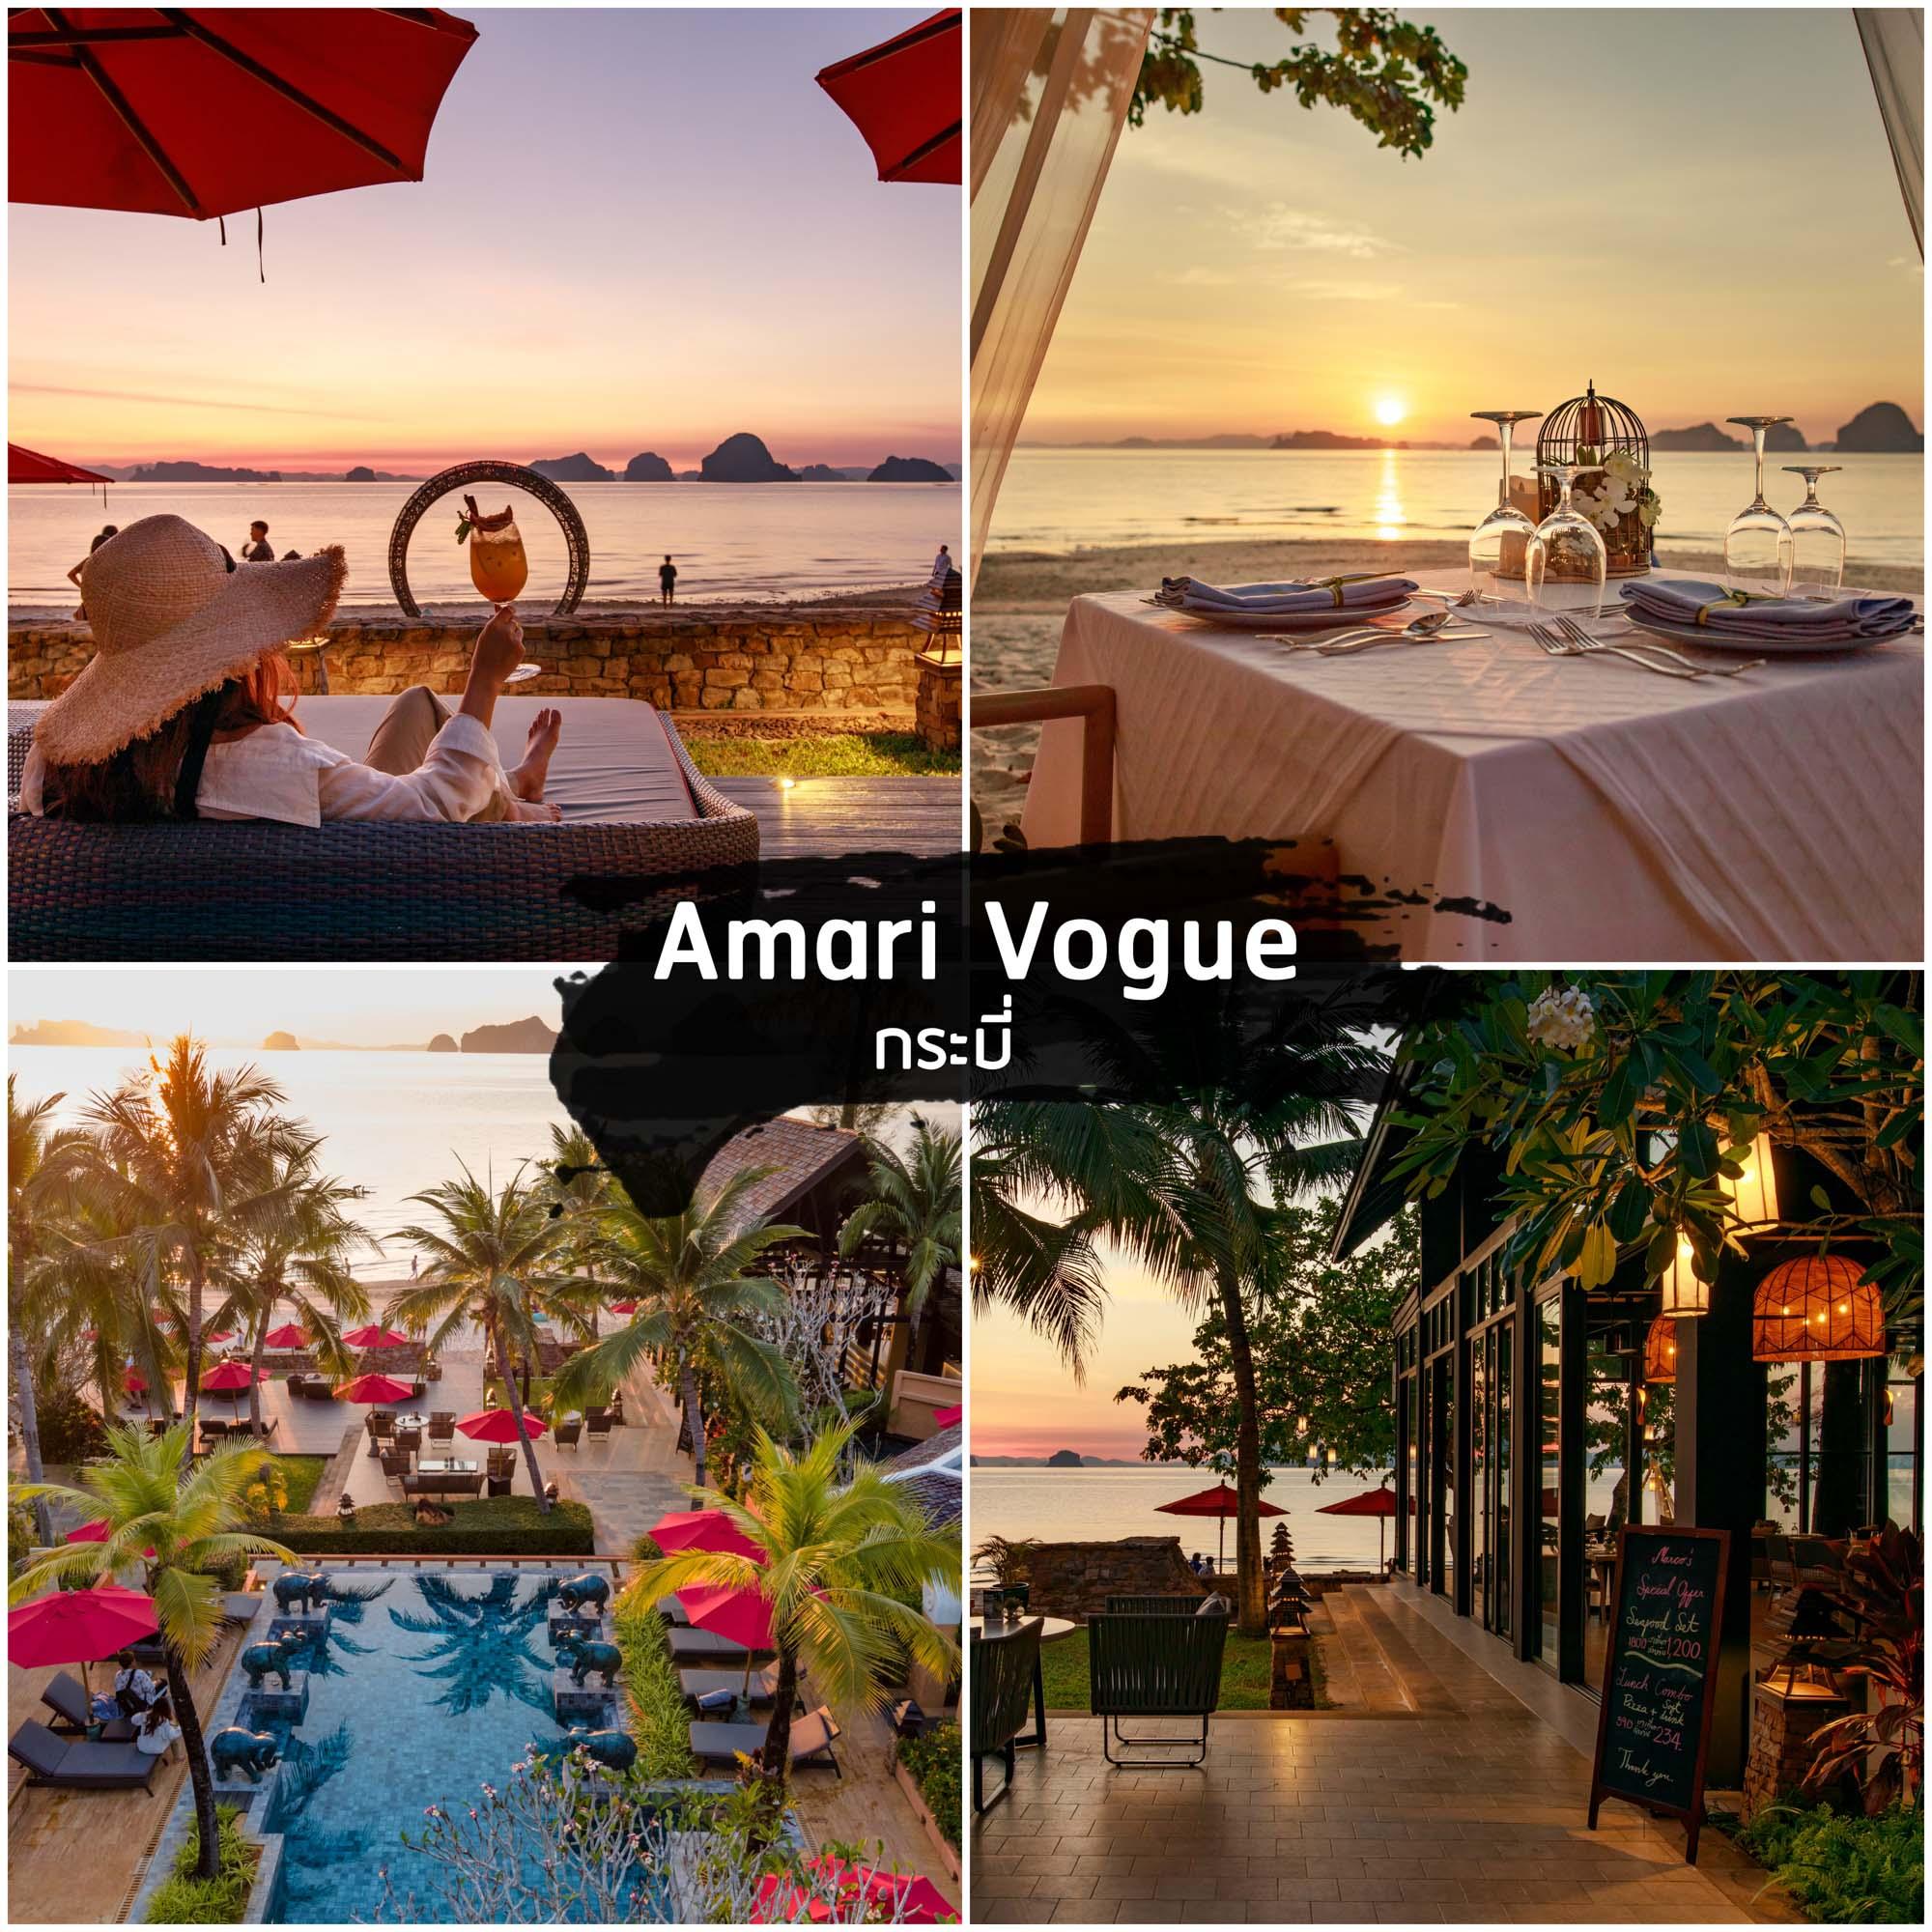 Amari-vogue-Krabi-อมารี-โวค-กระบี่ ที่พักกระบี่-รีสอร์ทโรงแรมระดับ-5-ดาวสุดสวยดีไซน์สไตล์โมเดิร์น-บนหาดทับแขก-ตกแต่งด้วยธีมร่มสีแดง-ตัดกับน้ำสีฟ้าและต้นไม้สีเขียว-บอกเลยว่าสวยมีสไตล์มากๆ-ชมพระอาทิตย์ตกกันฟินๆ-ด้วยความที่หาดทับแขก-เป็นหาดที่เงียบๆ--ทะเลไม่ลึก-เหมาะแก่การพักผ่อนแบบสบายๆ-ชายหาดเงียบสงบสายชิว-สายฟินๆ-นั่งชิวริมทะเลต้องห้ามพลาด-ภายในโรงแรมตกแต่งแบบสถาปัตยกรรมไทยสไตล์ล้านนา-โอบล้อมไปด้วยสีเขียวต้นไม้-มีบริการรถของโรงแรมรับ-ส่ง-สนามบิน-ซึ่งหากจากตัวเมืองกระบี่ประมาณ-45-กม.-มีห้องพักทั้งหมด-5-Type-คือ-Deluxe-King-,--Grand-Deluxe-King ,Grand-Deluxe-Jacuzzi ,Spa-Suite ,One-Bedroom-Villa-ทุกห้องจะวิวทะเลเกือบทั้งหมด-เรียกได้ว่าสาย-Seaview-ต้องห้ามพลาดกันเลยทีเดียว ที่พัก,กระบี่,อ่าวนาง,วิวหลักล้าน,โรงแรม,รีสอร์ท,krabi,เกาะพีพี